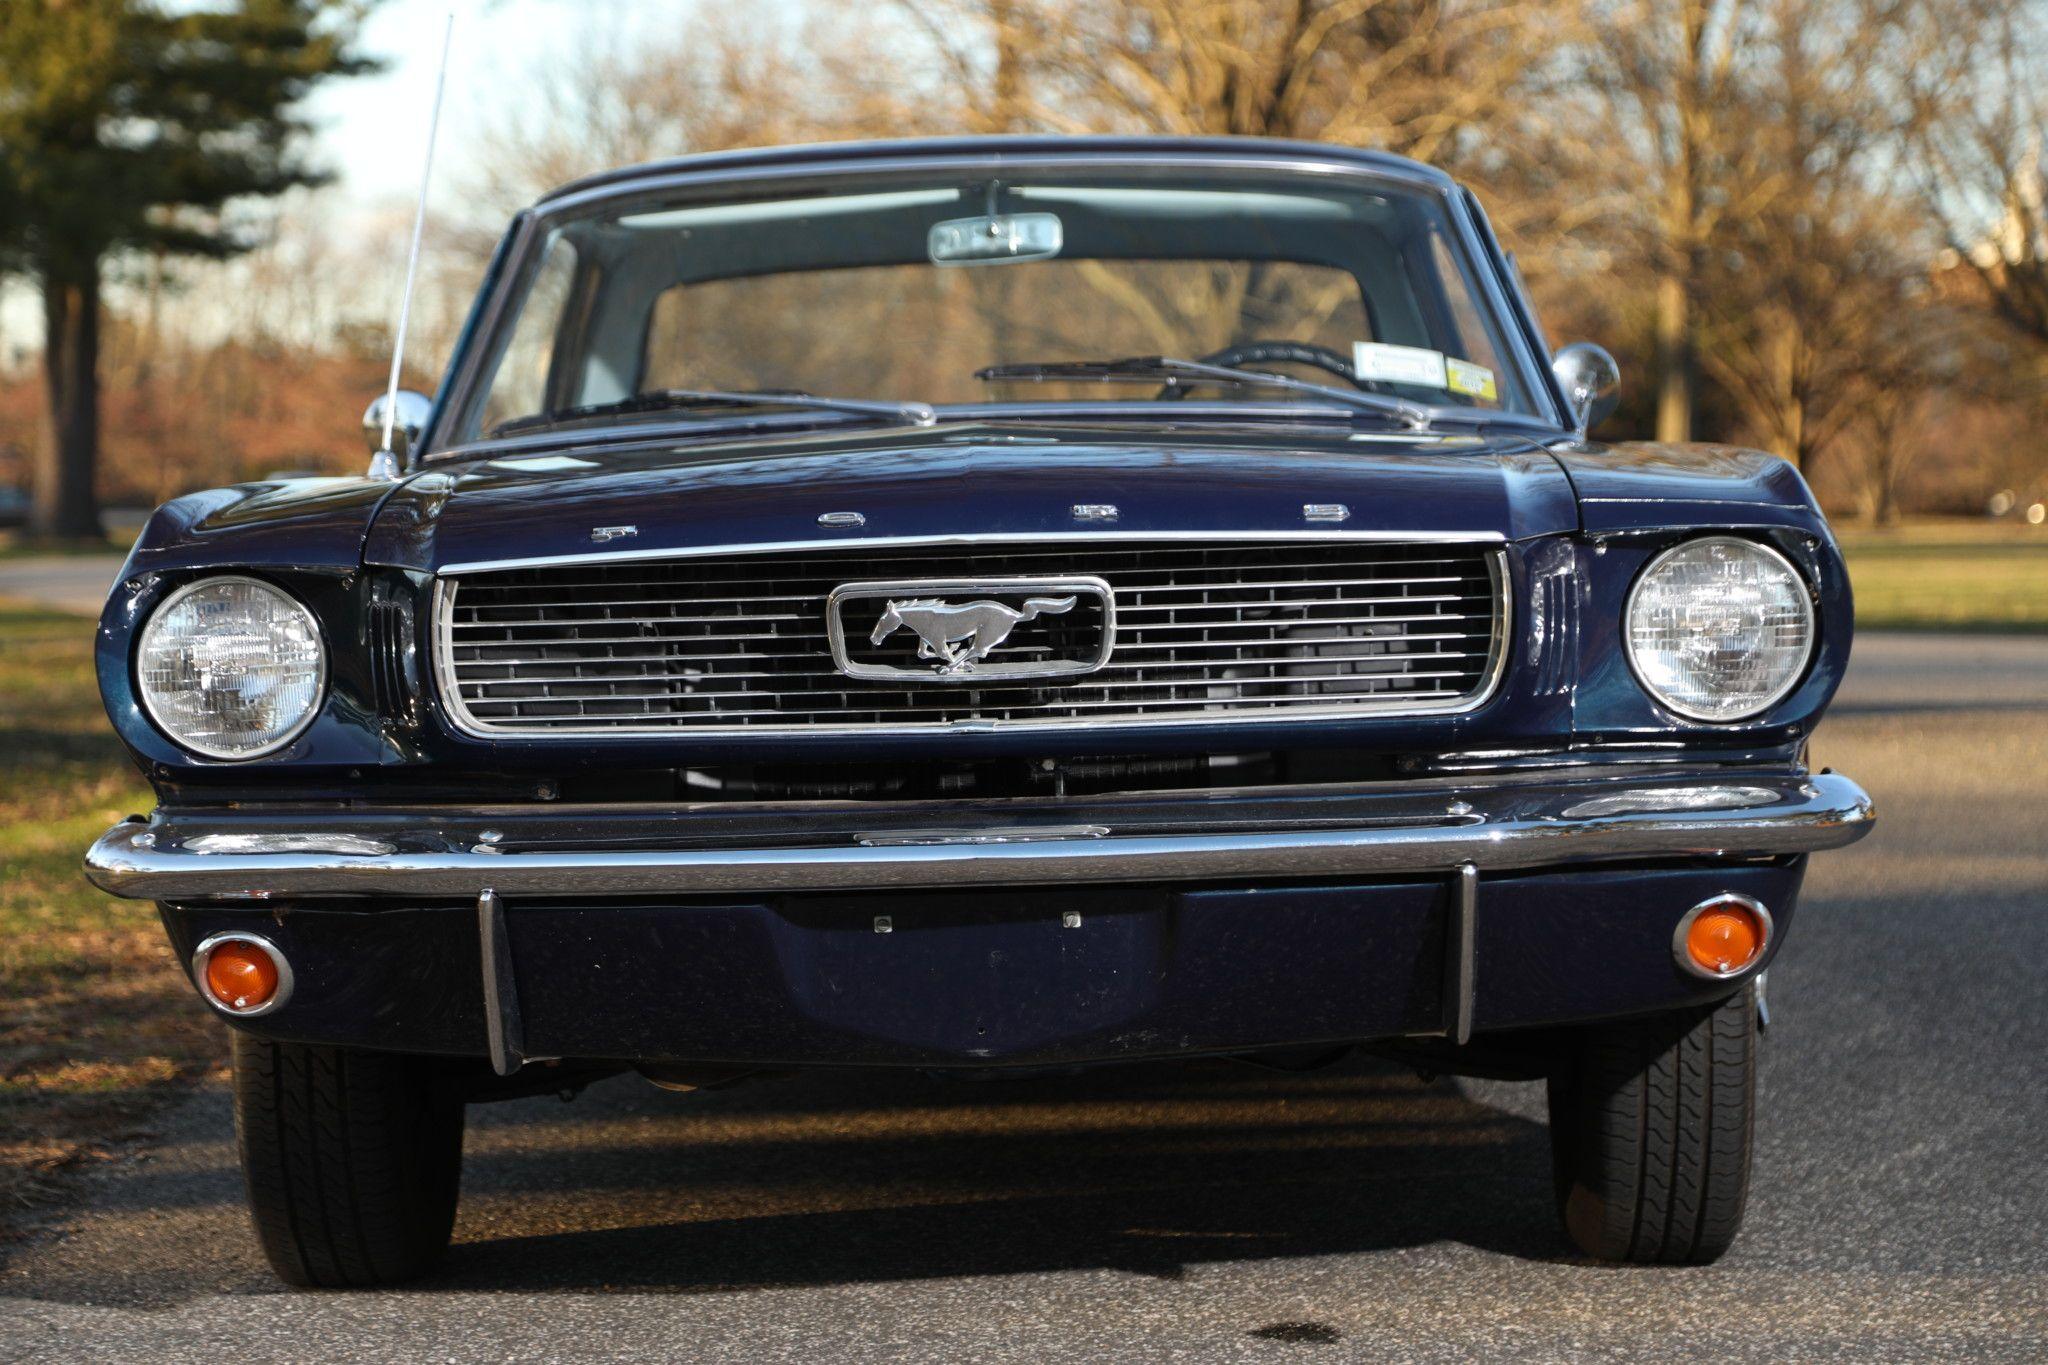 1966 Ford Mustang Hardtop 1966 Ford Mustang Ford Mustang Mustang